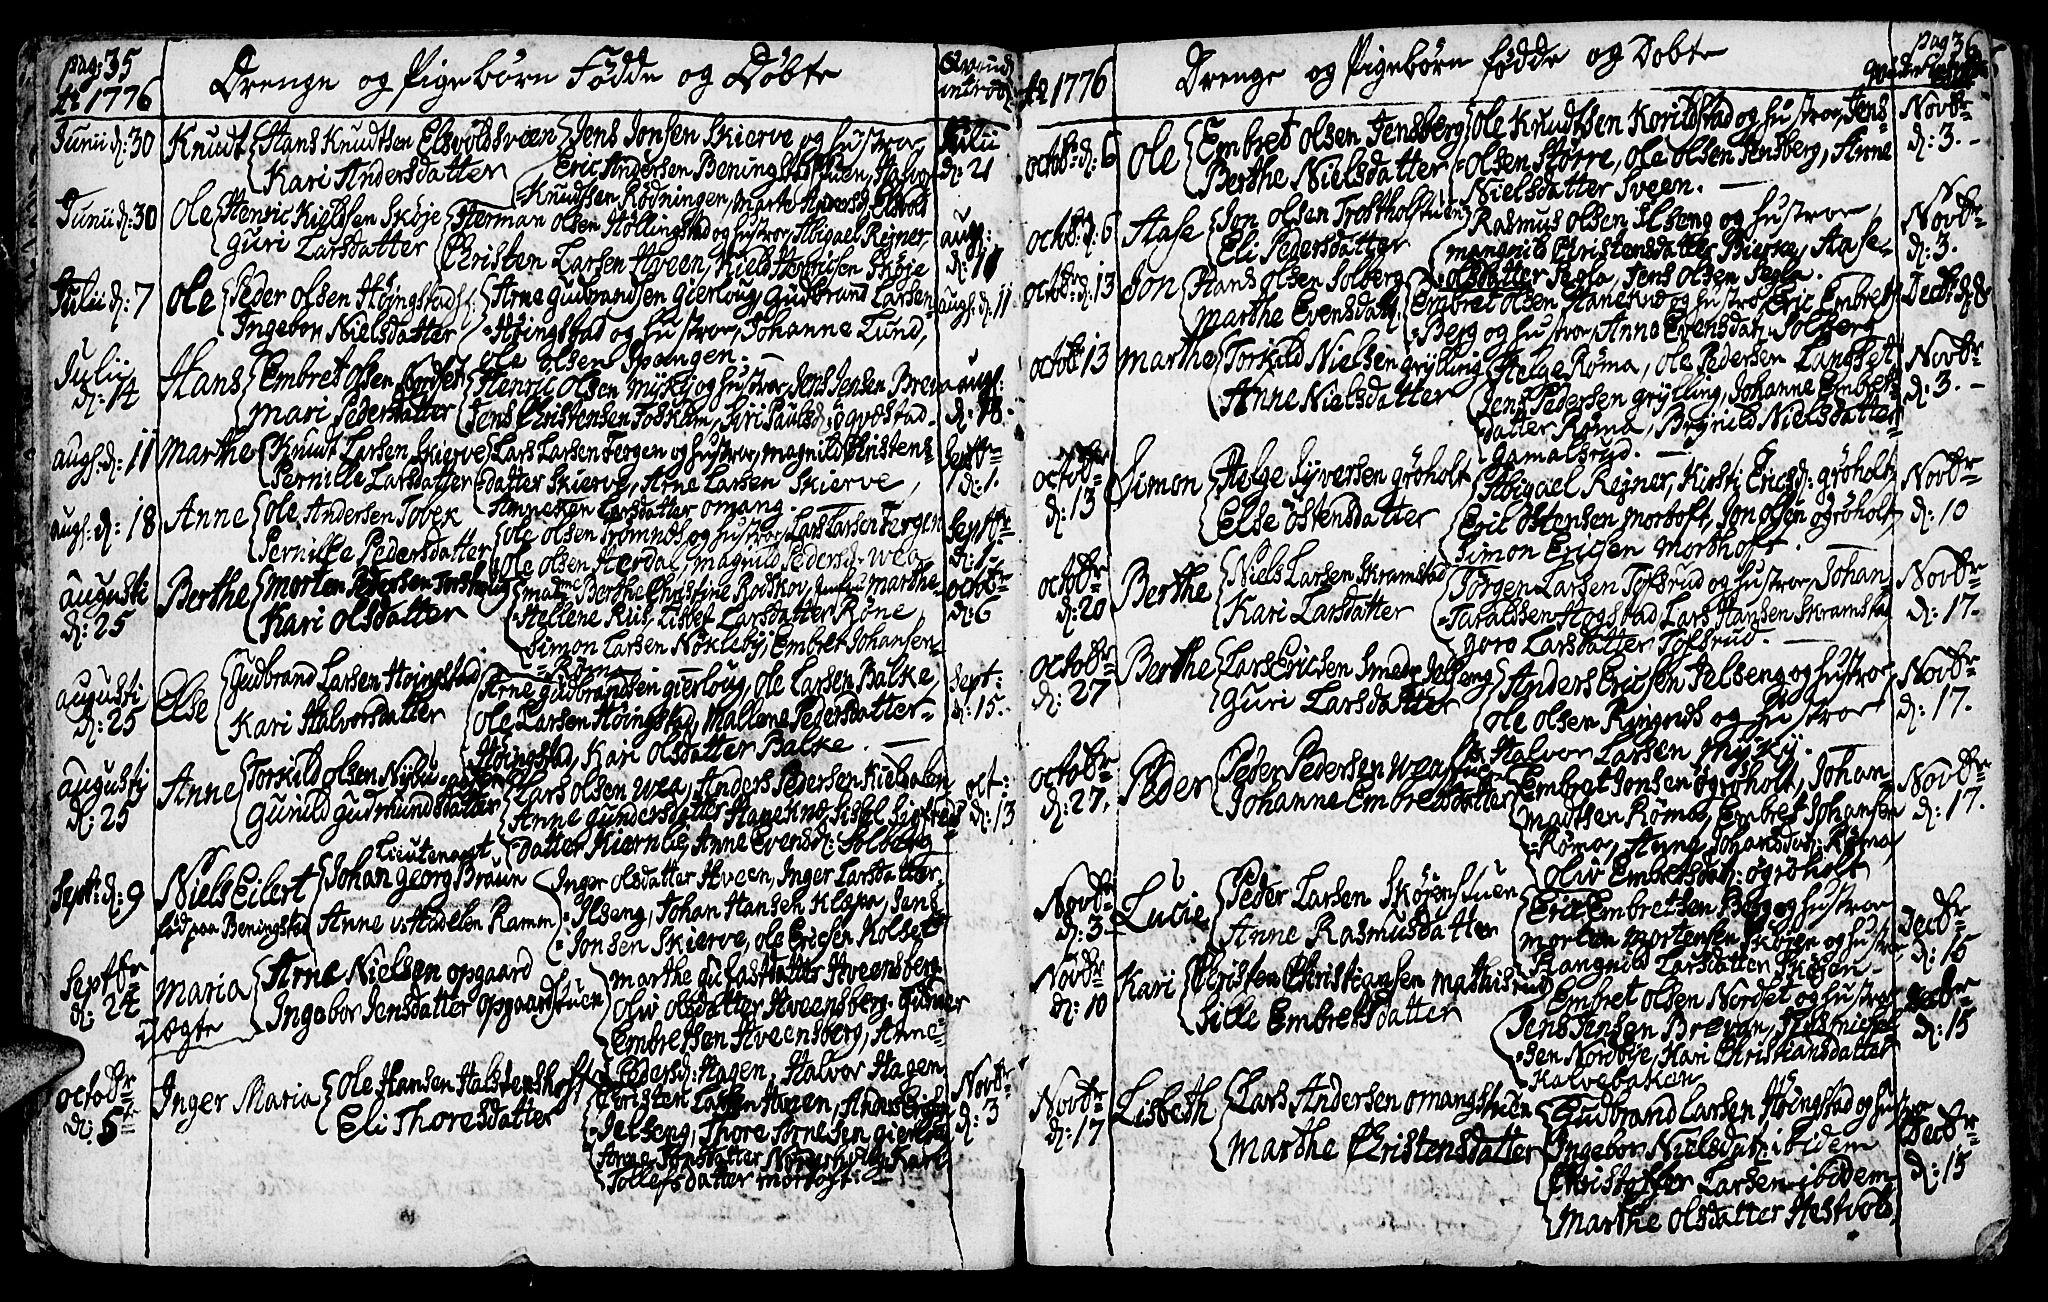 SAH, Løten prestekontor, K/Ka/L0003: Ministerialbok nr. 3, 1773-1800, s. 35-36